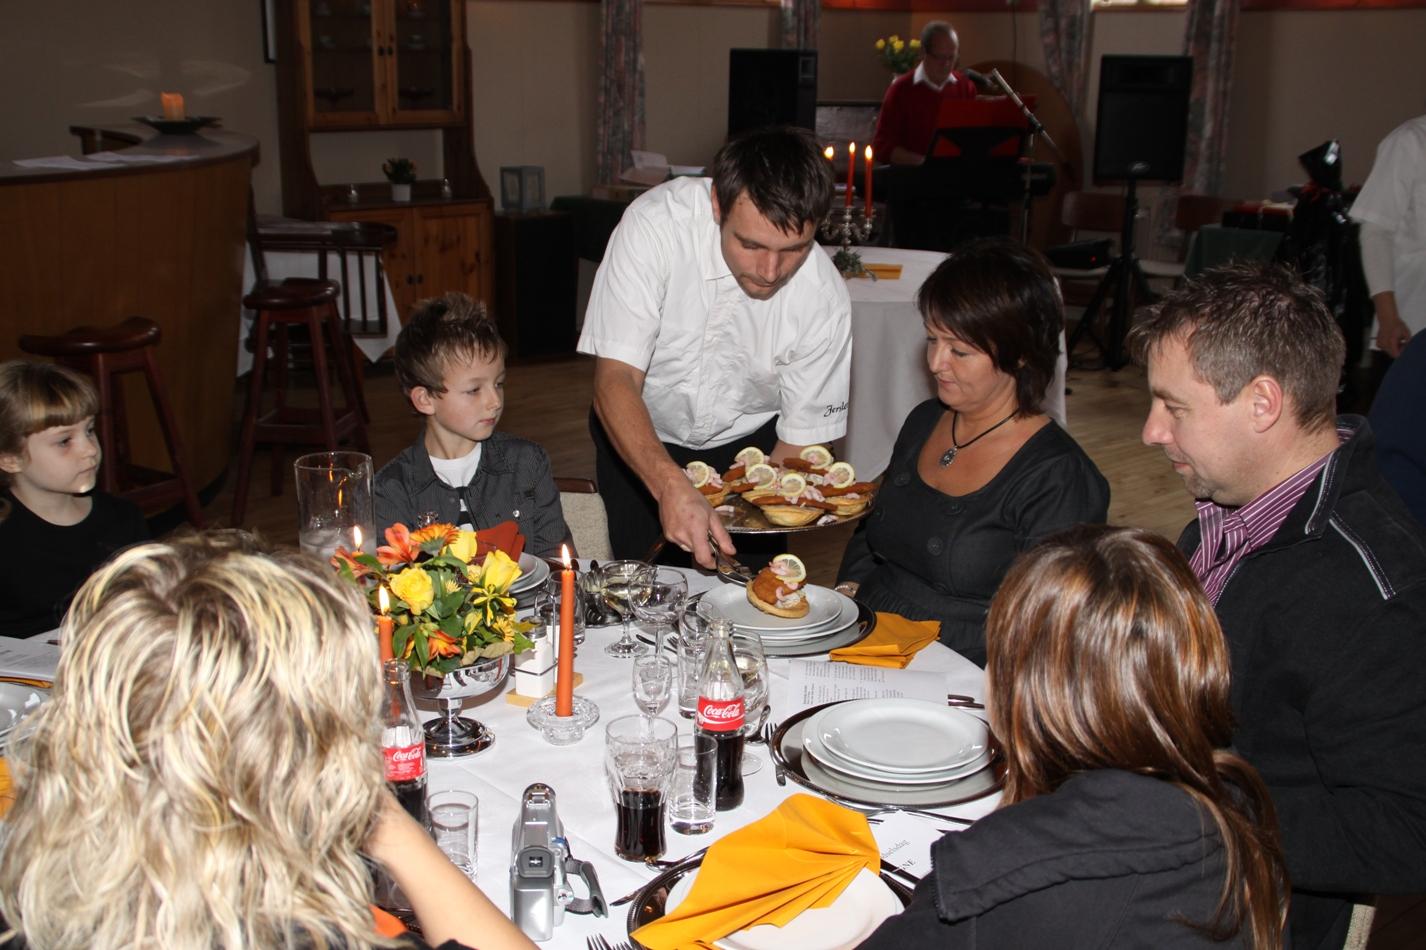 IMG_5155 JØRGEN 75ÅR 08-11-2008 (34)